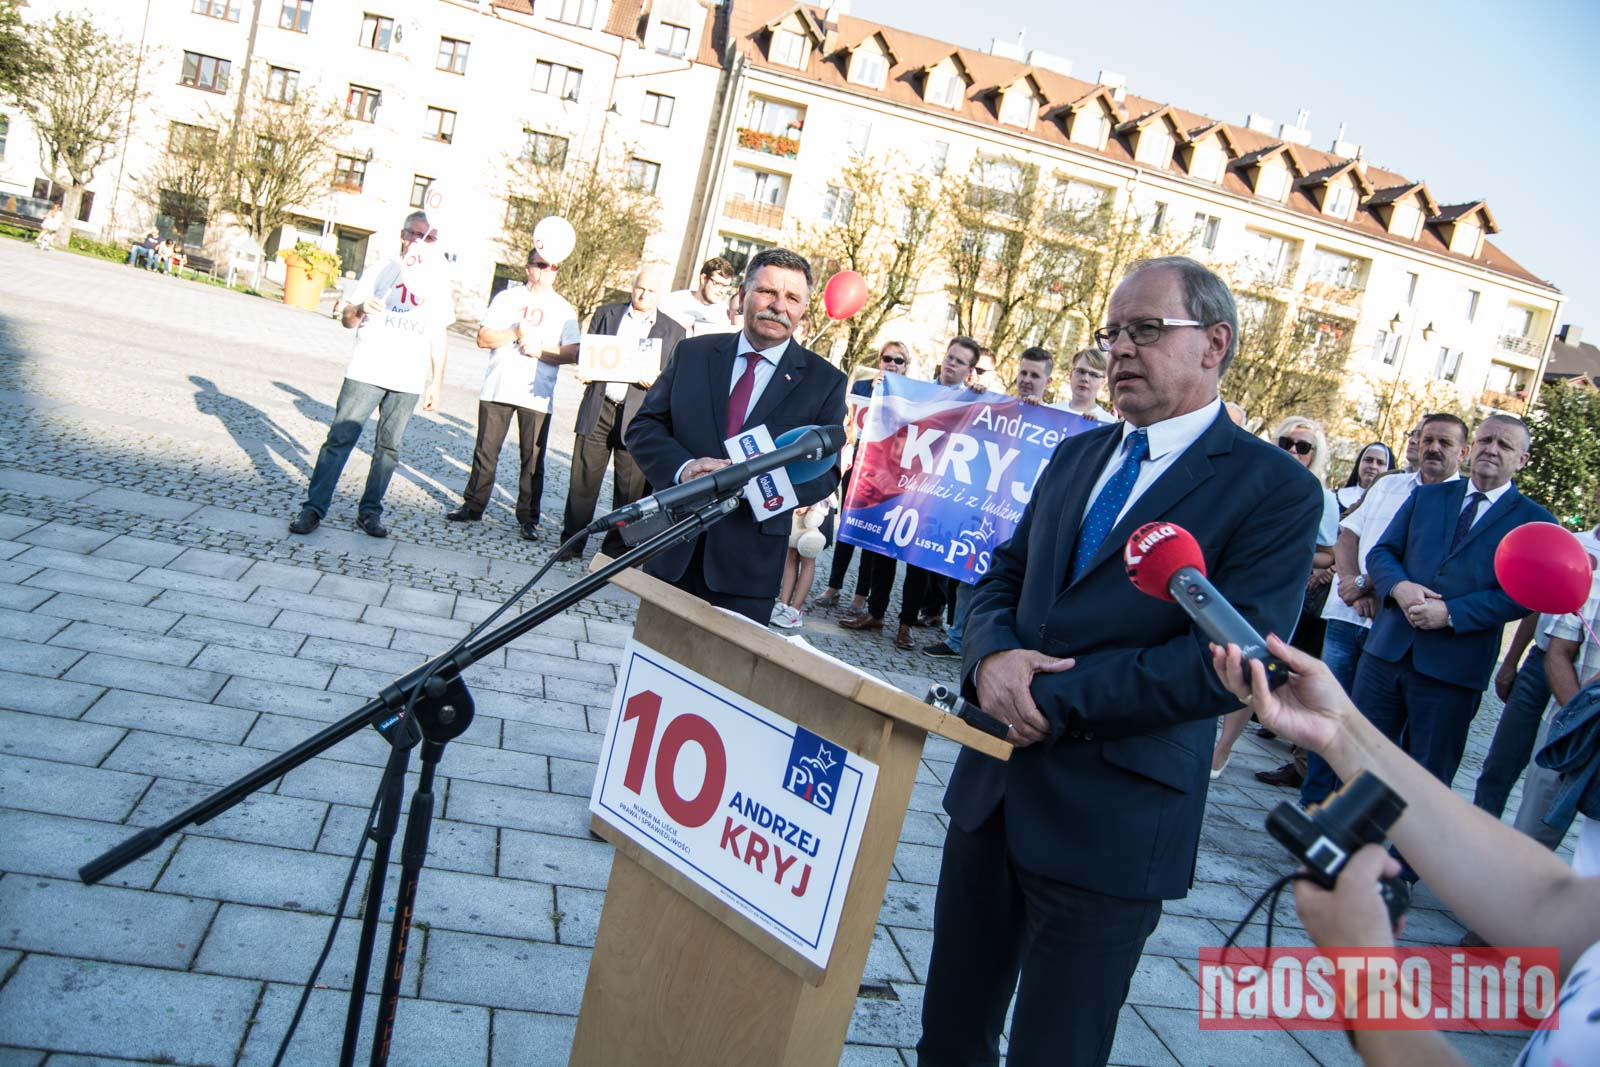 NaOSTRO Andrzej Kryj kampania-18